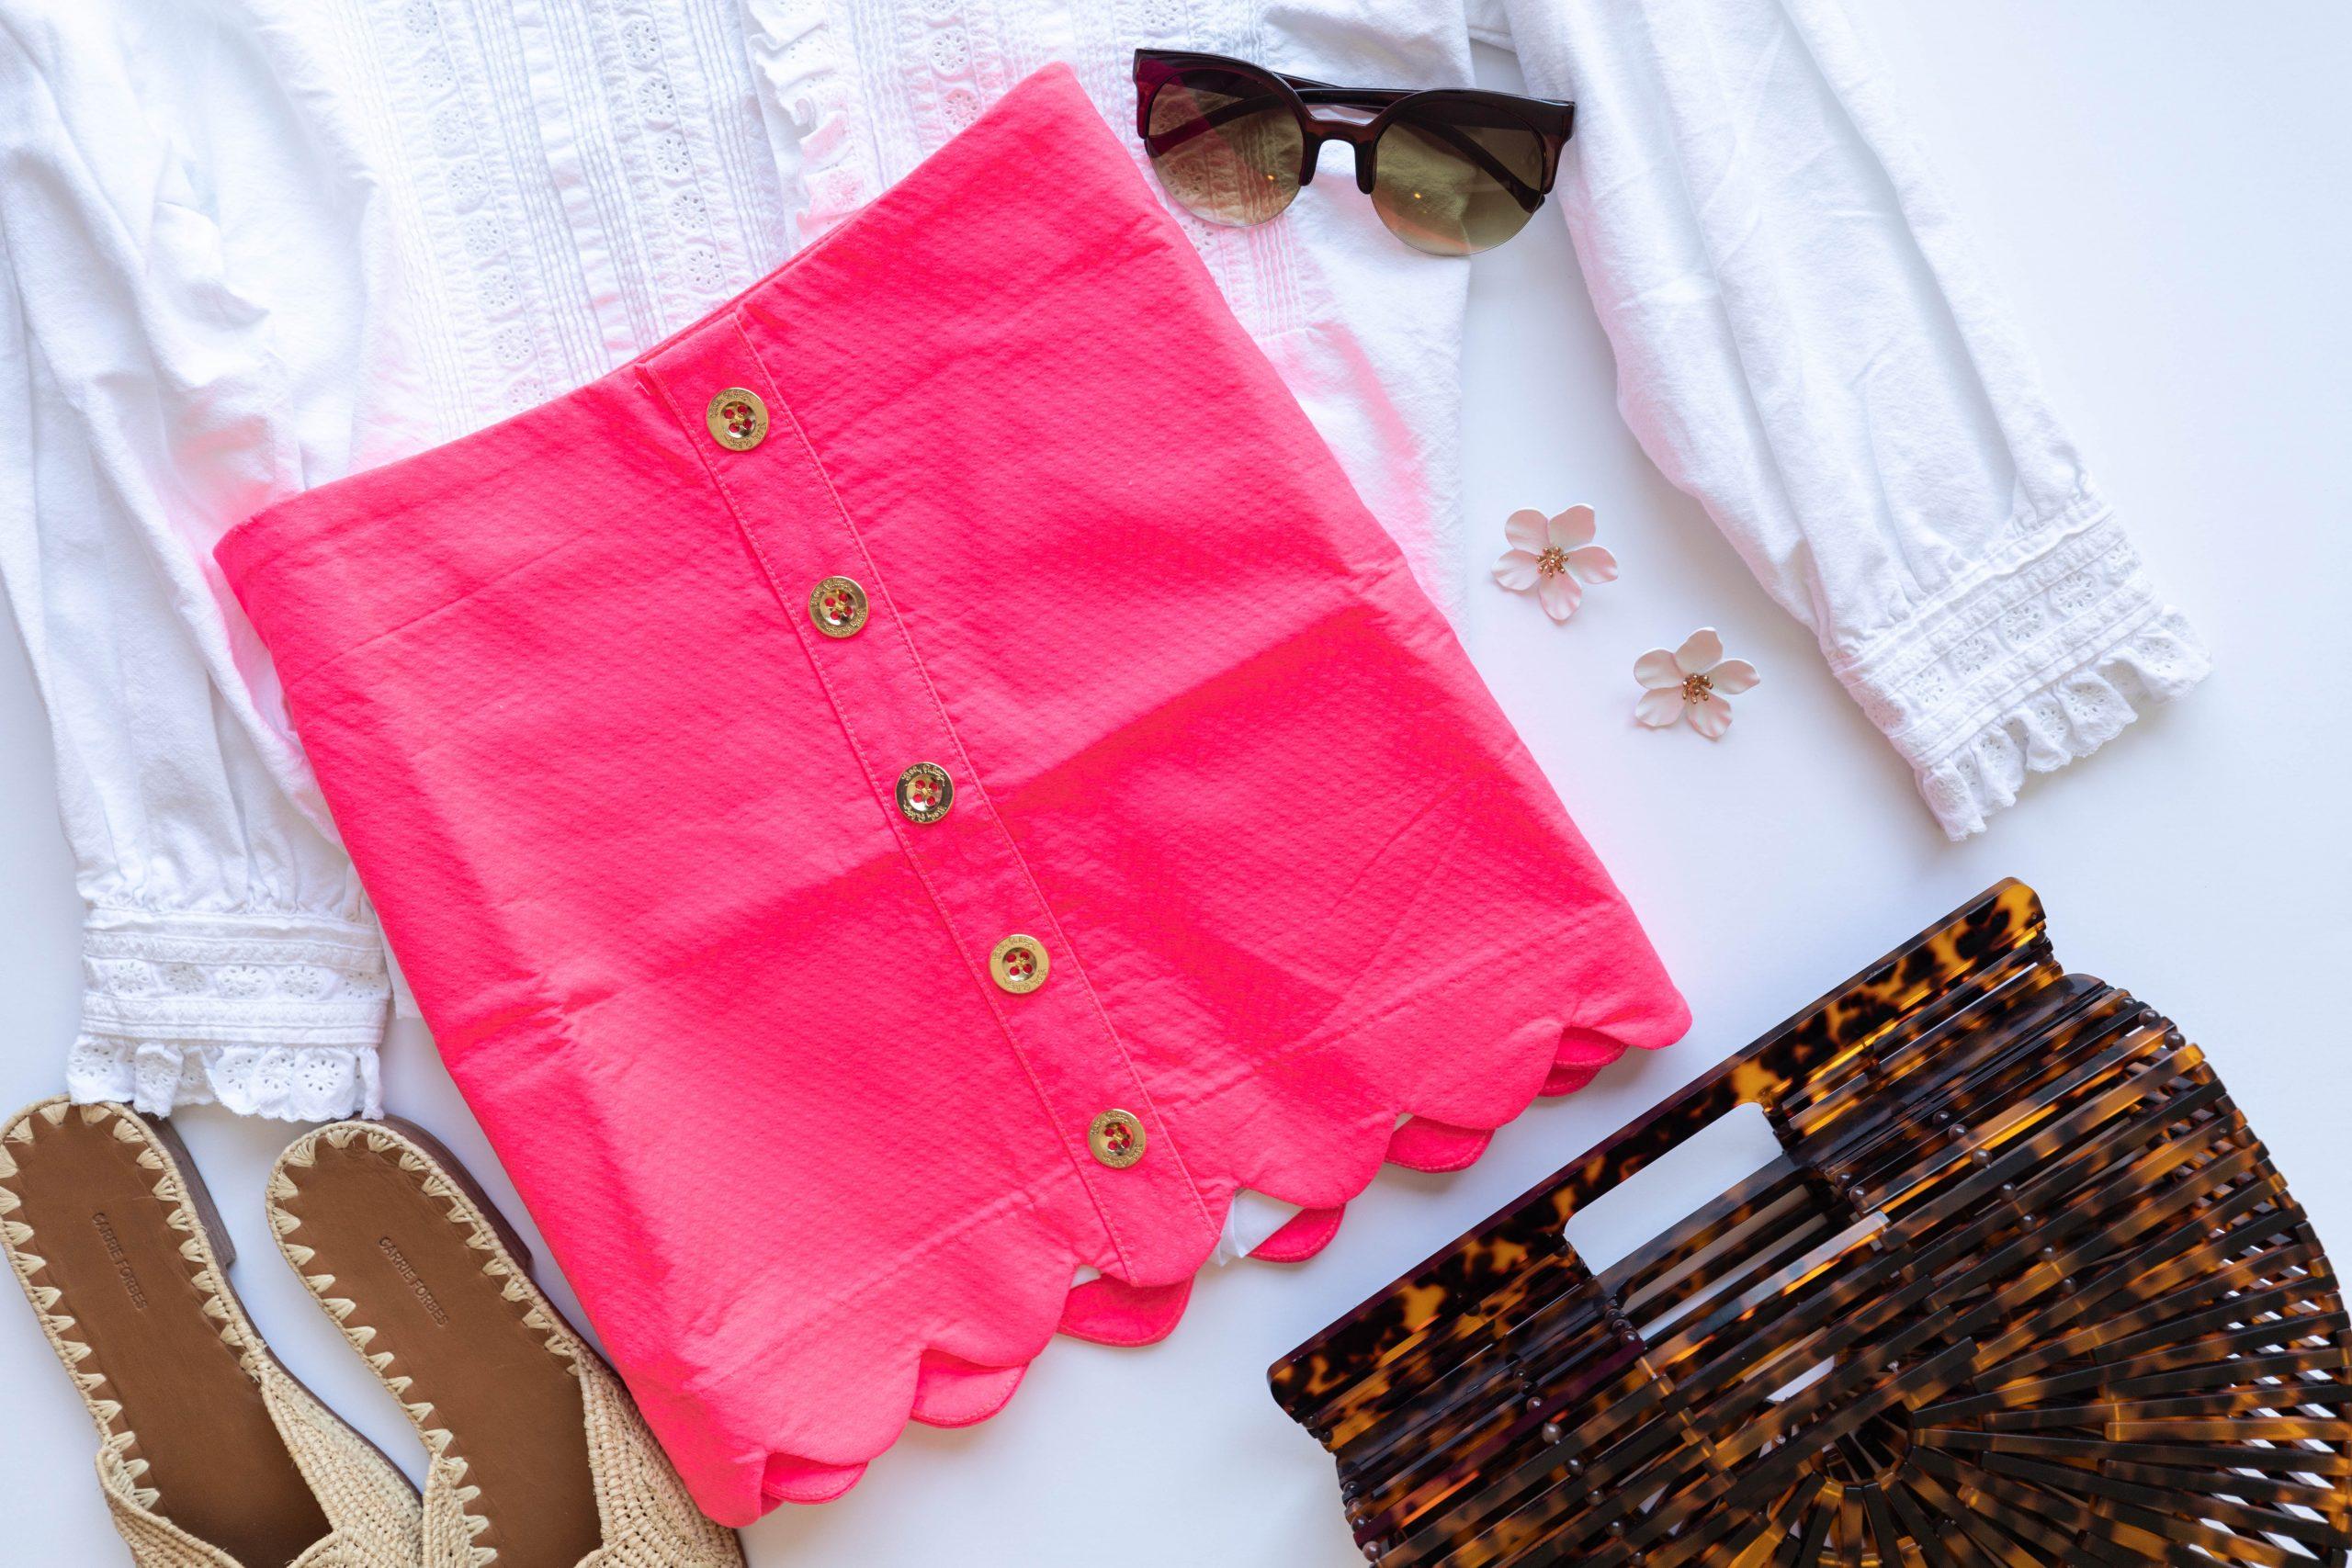 Lilly Pulitzer Kaylie Button Down Skort in Love Potion Pink